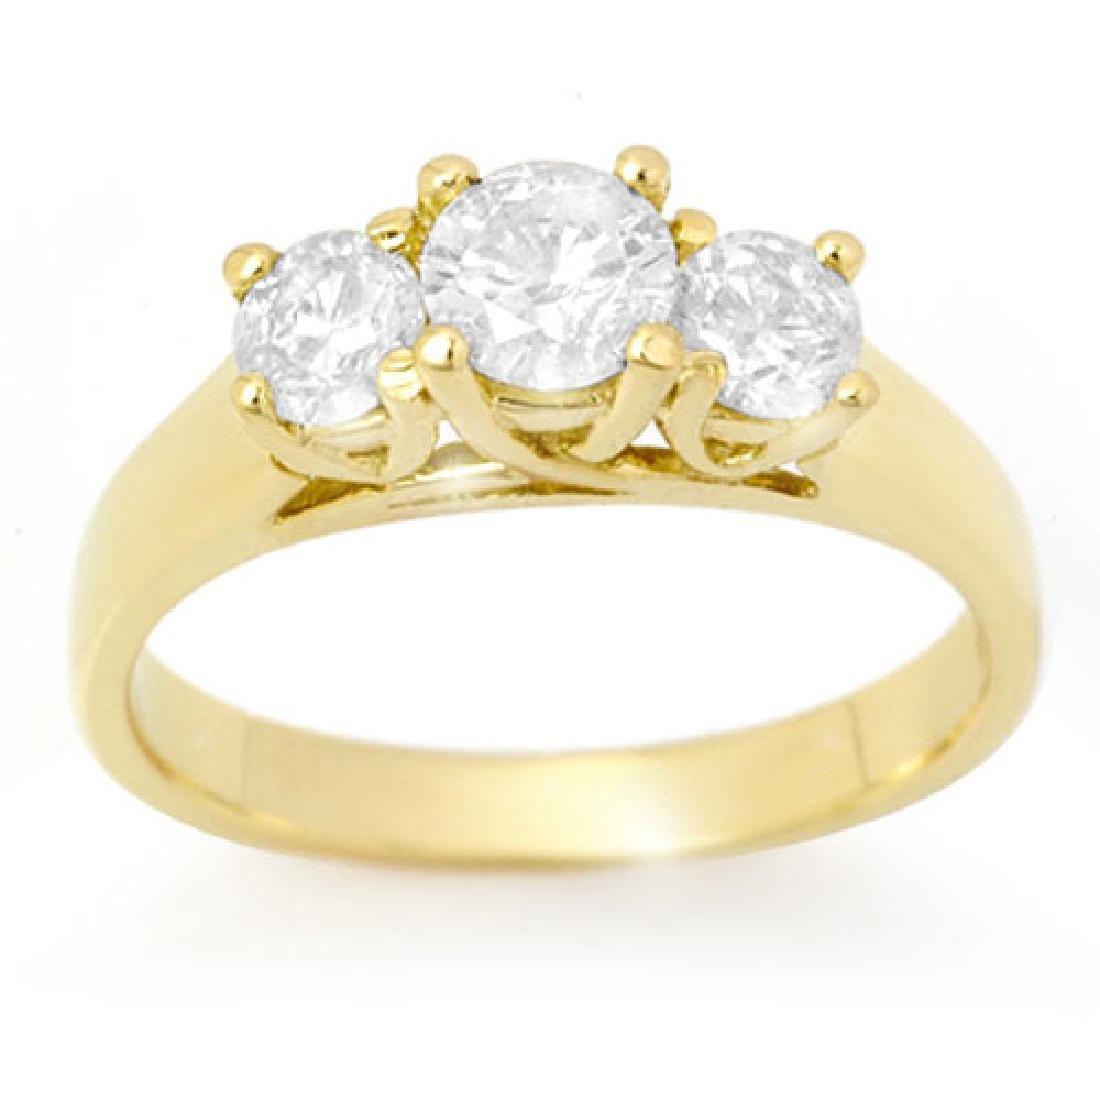 0.75 CTW VS/SI Diamond 3 Stone Ring 18K Yellow Gold - 2